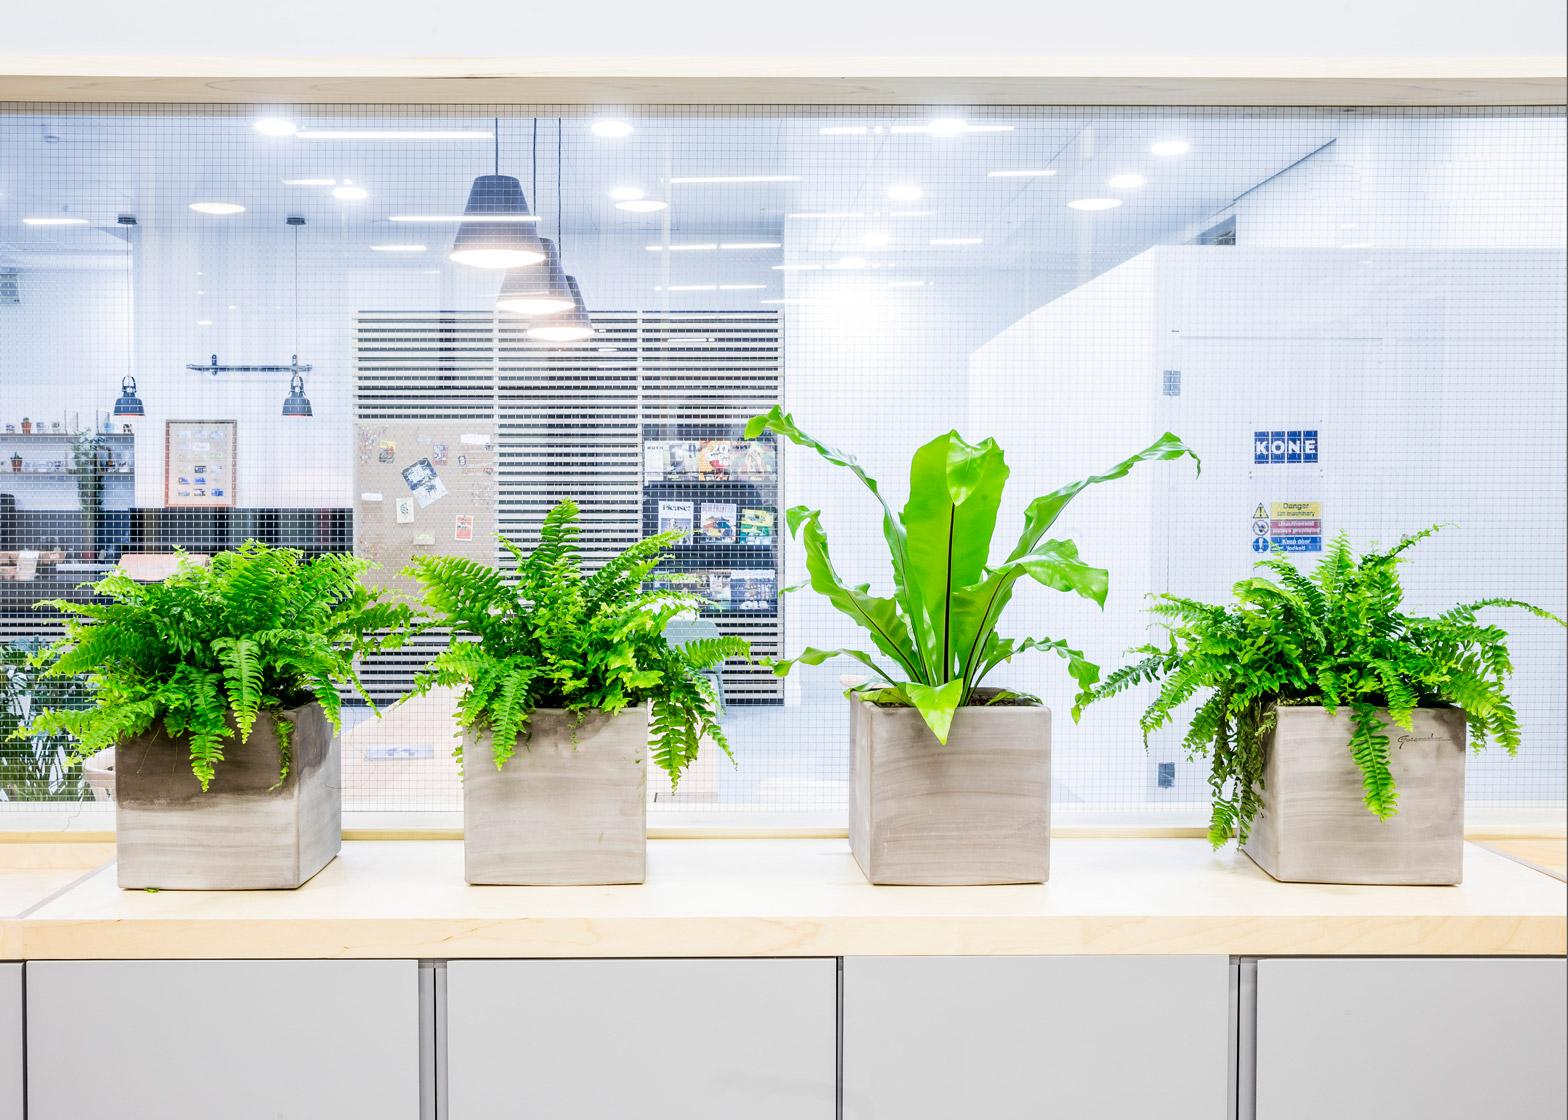 barclaycard-agile-workplace-APA-london-interior-design_dezeen_1568_4